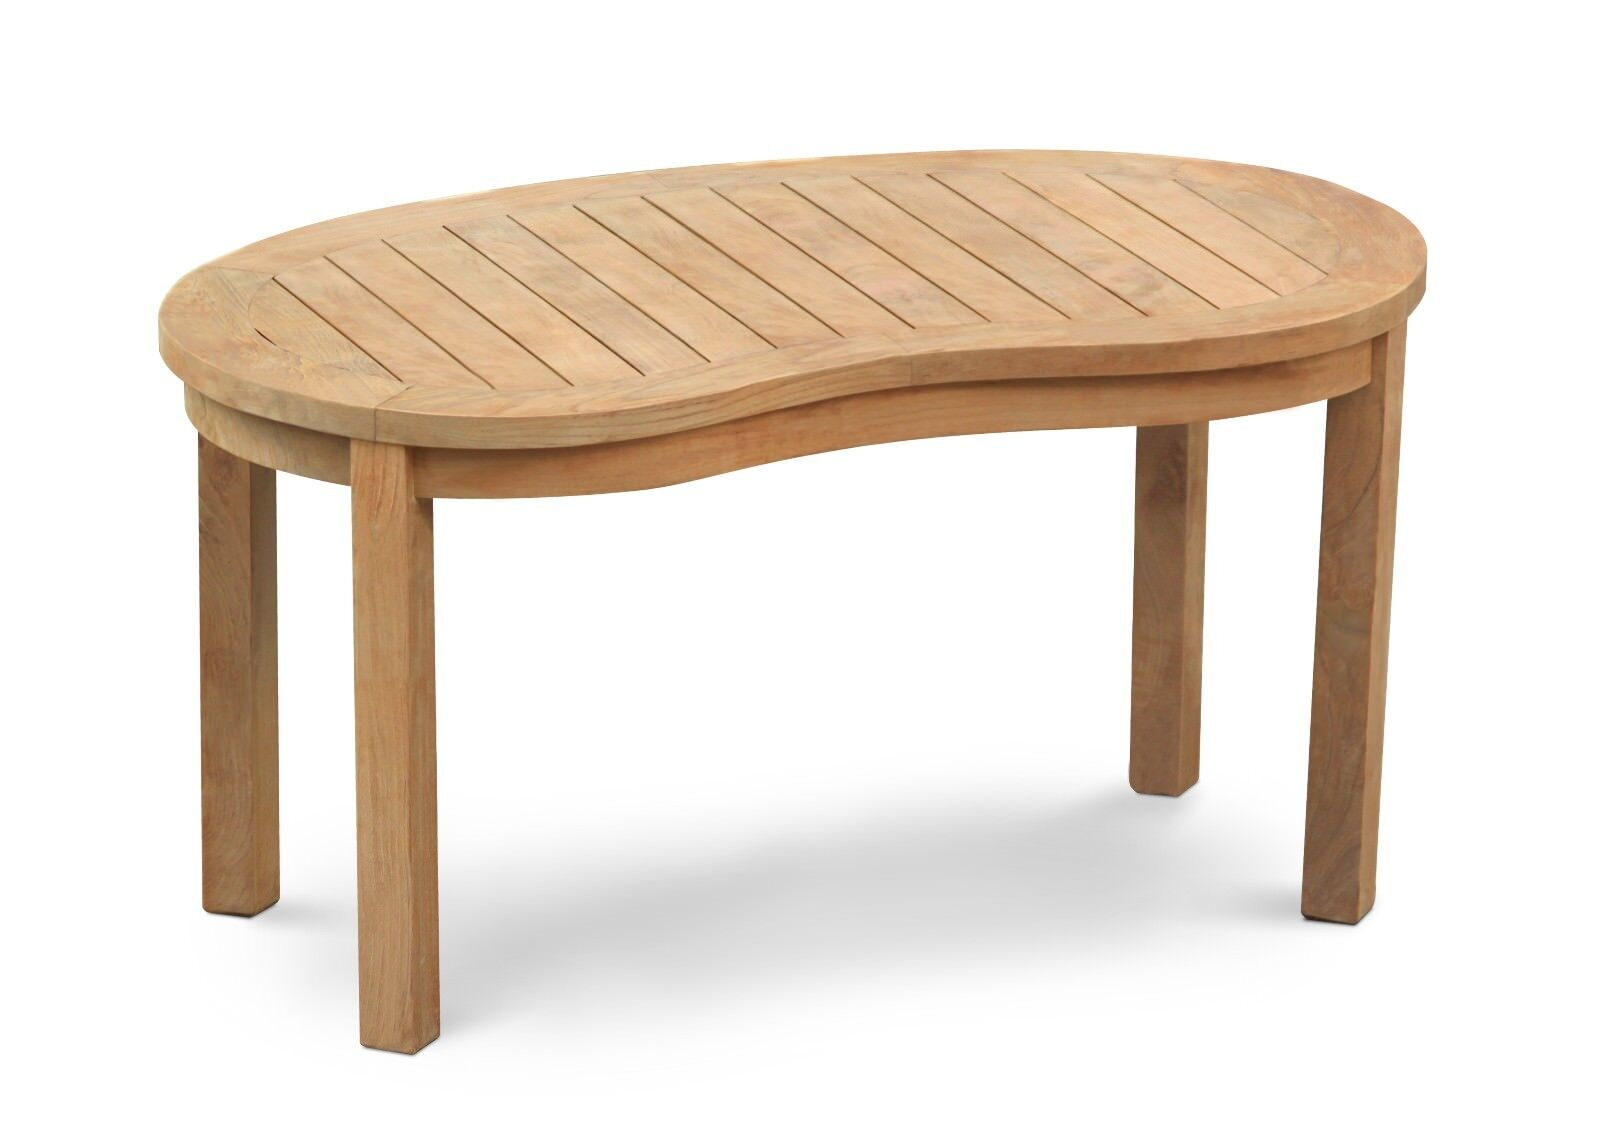 Premium TEAK Banana Coffee Table - 108 cm - Oval Kidney ...